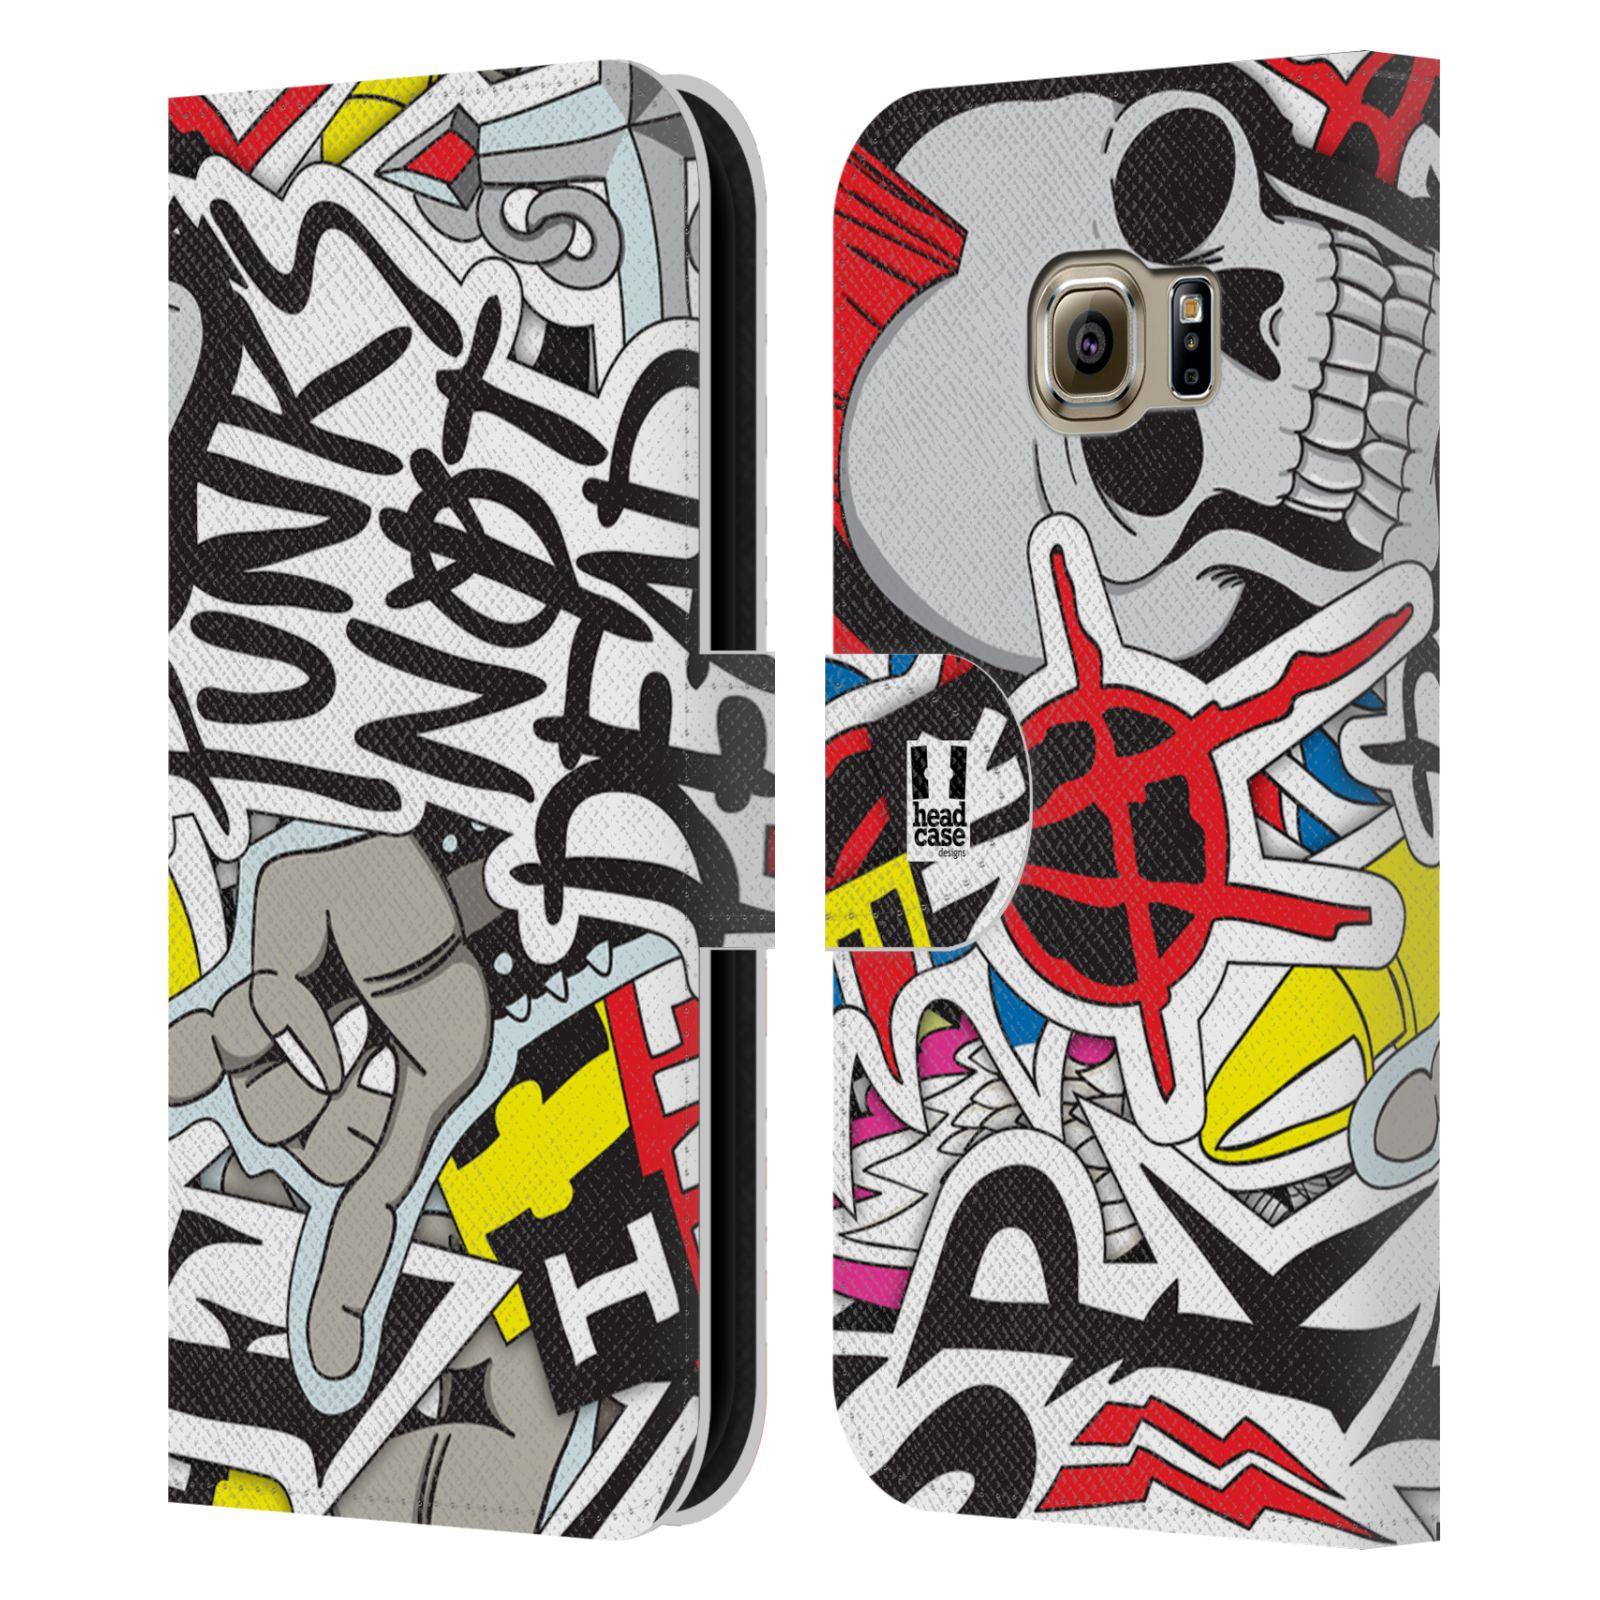 HEAD CASE Flipové pouzdro pro mobil Samsung Galaxy S6 EDGE vzor STICKER nálepky PUNK IS NOT DEAD